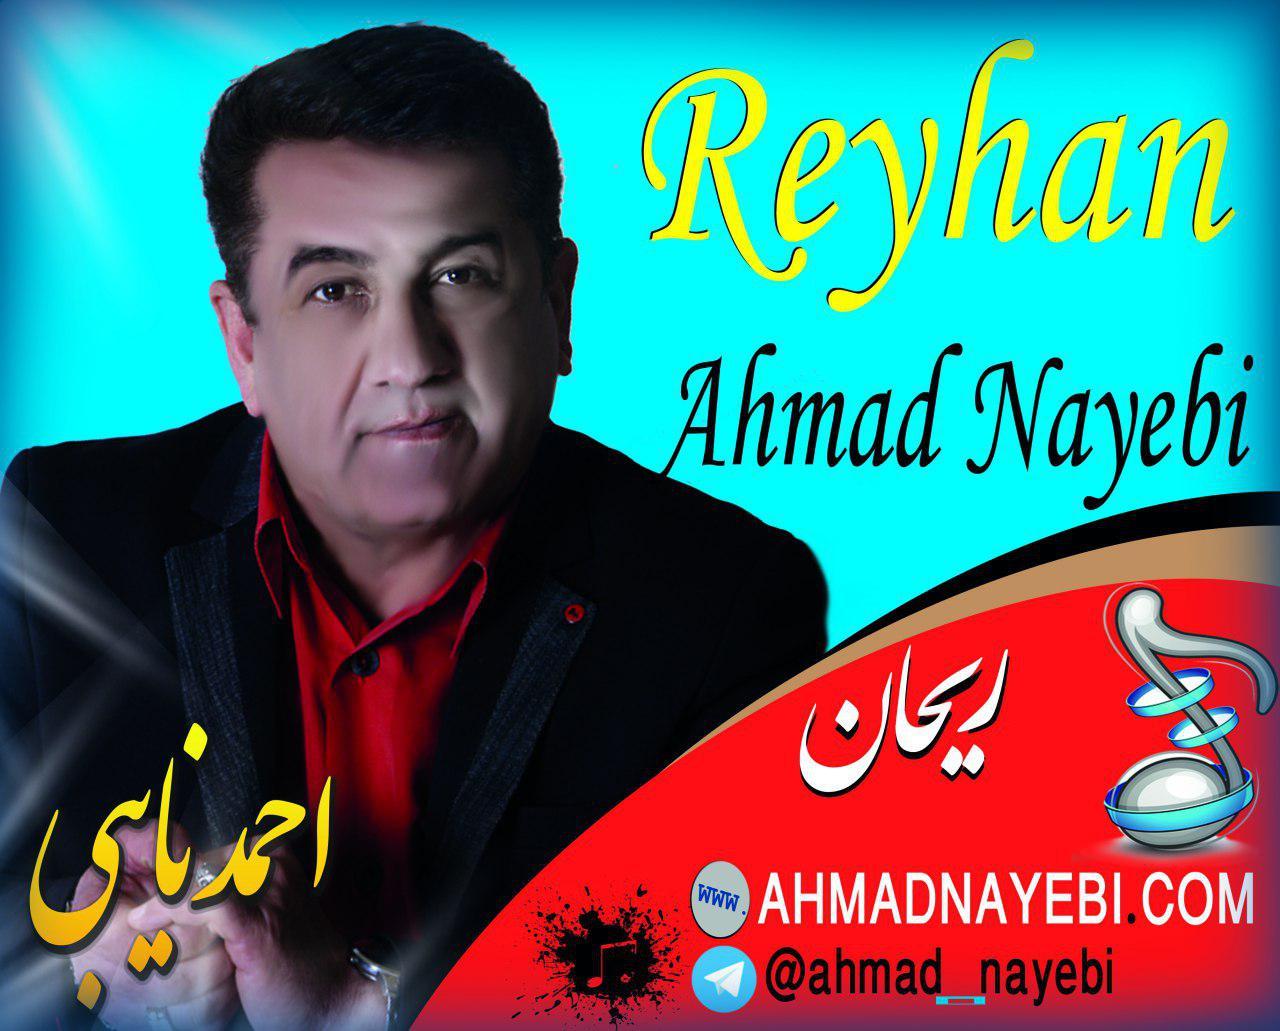 http://s9.picofile.com/file/8295318600/2Ahmad_Nayebi_Reyhan.jpg